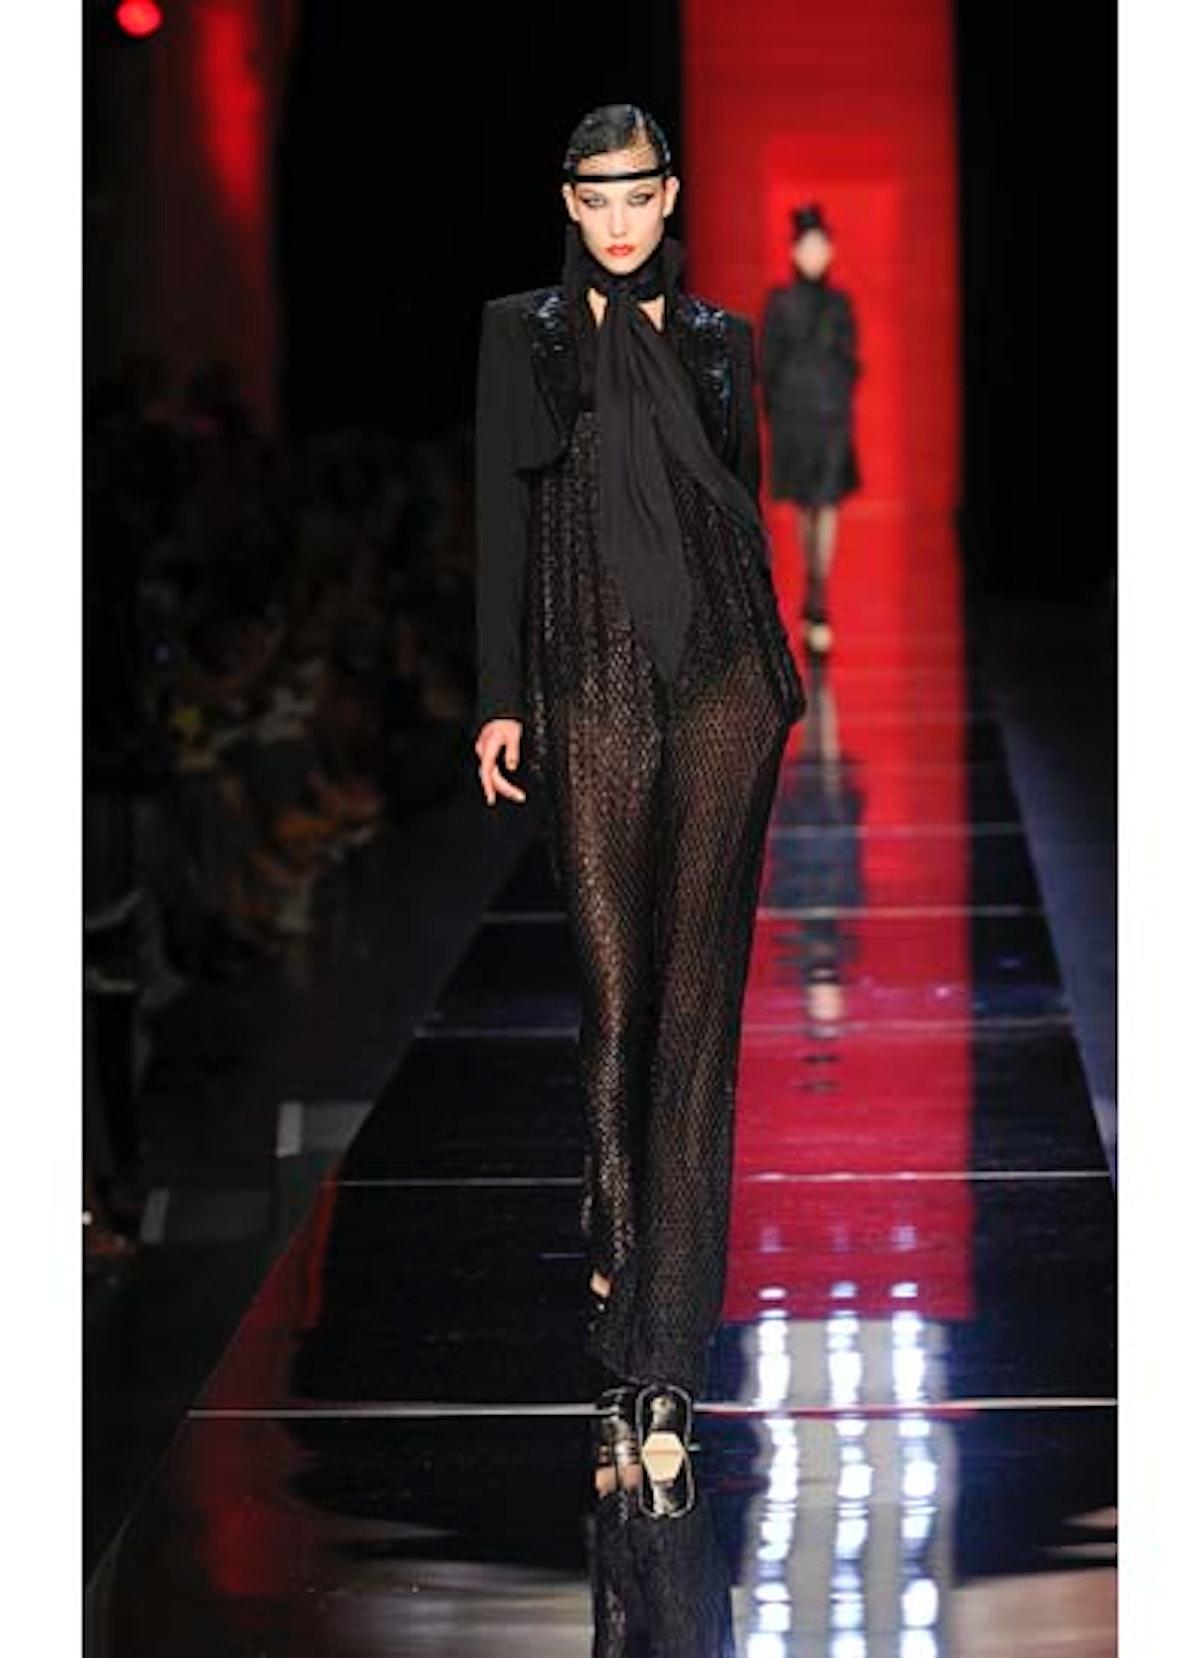 fass-jean-paul-gaultier-couture-2012-runway-05-v.jpg